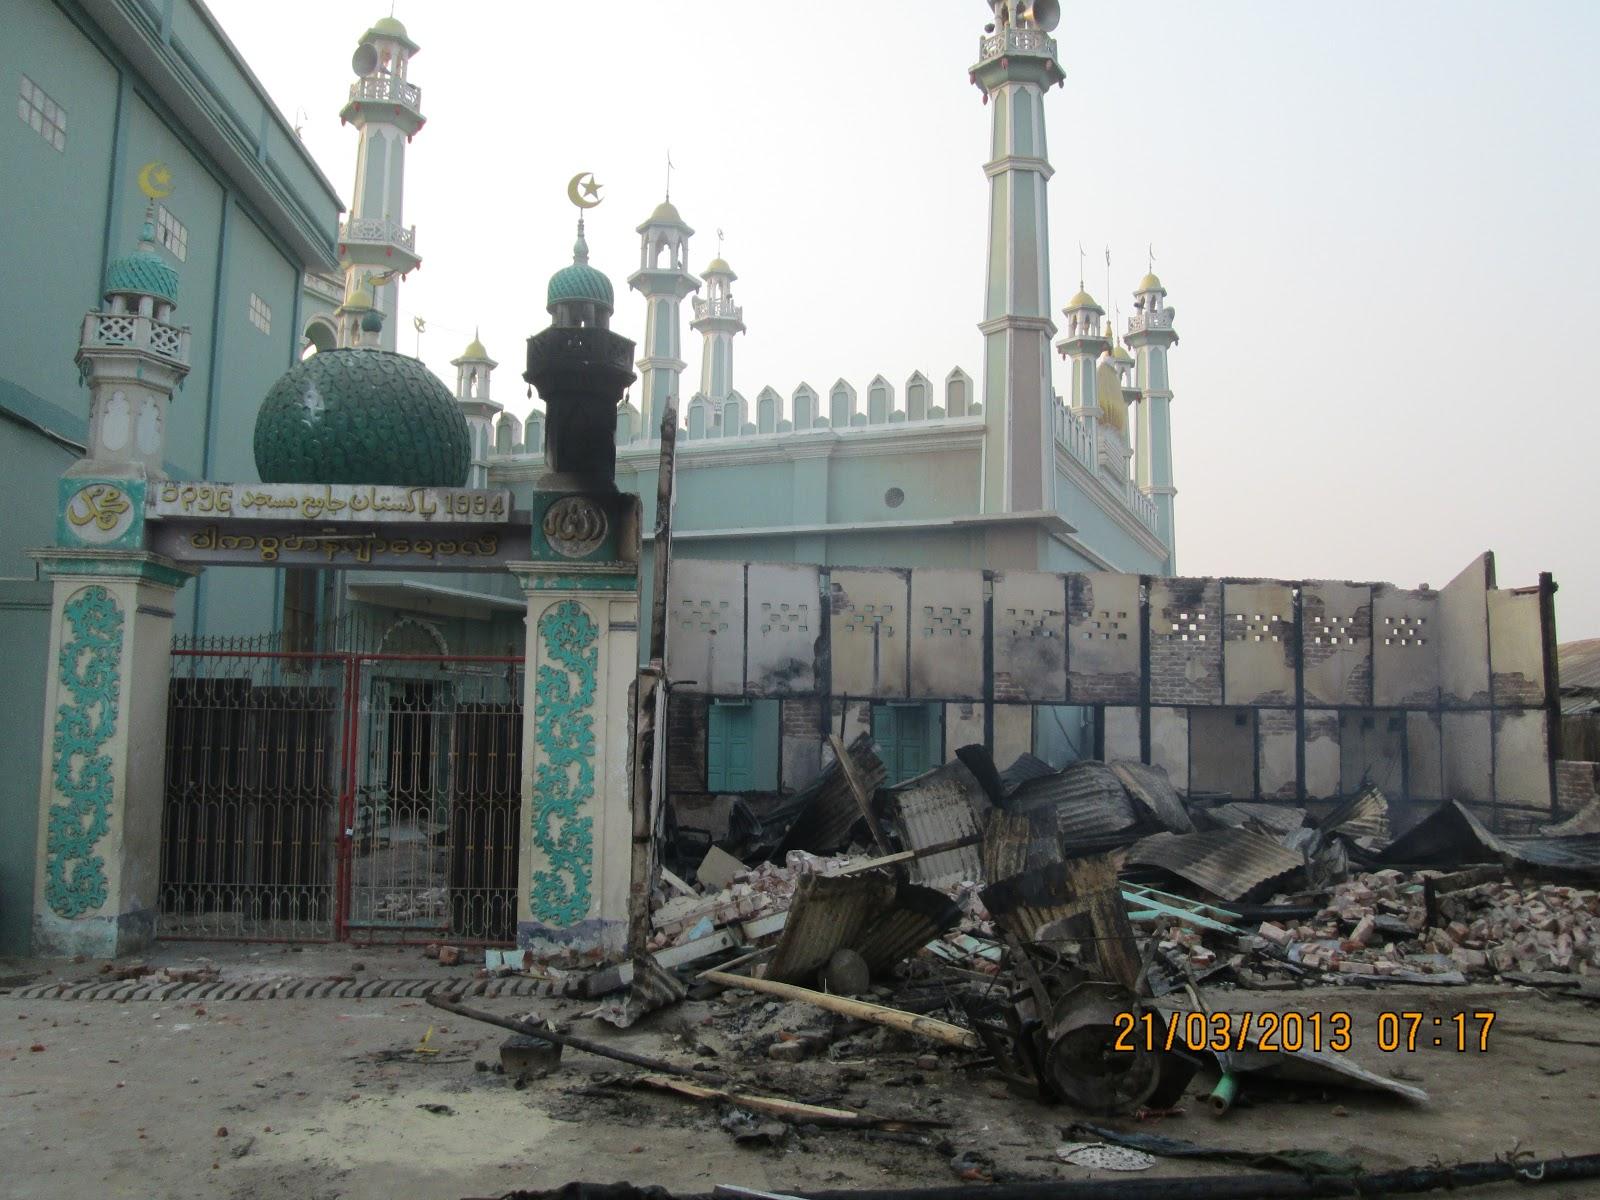 2013-04-03-mosque1.jpg